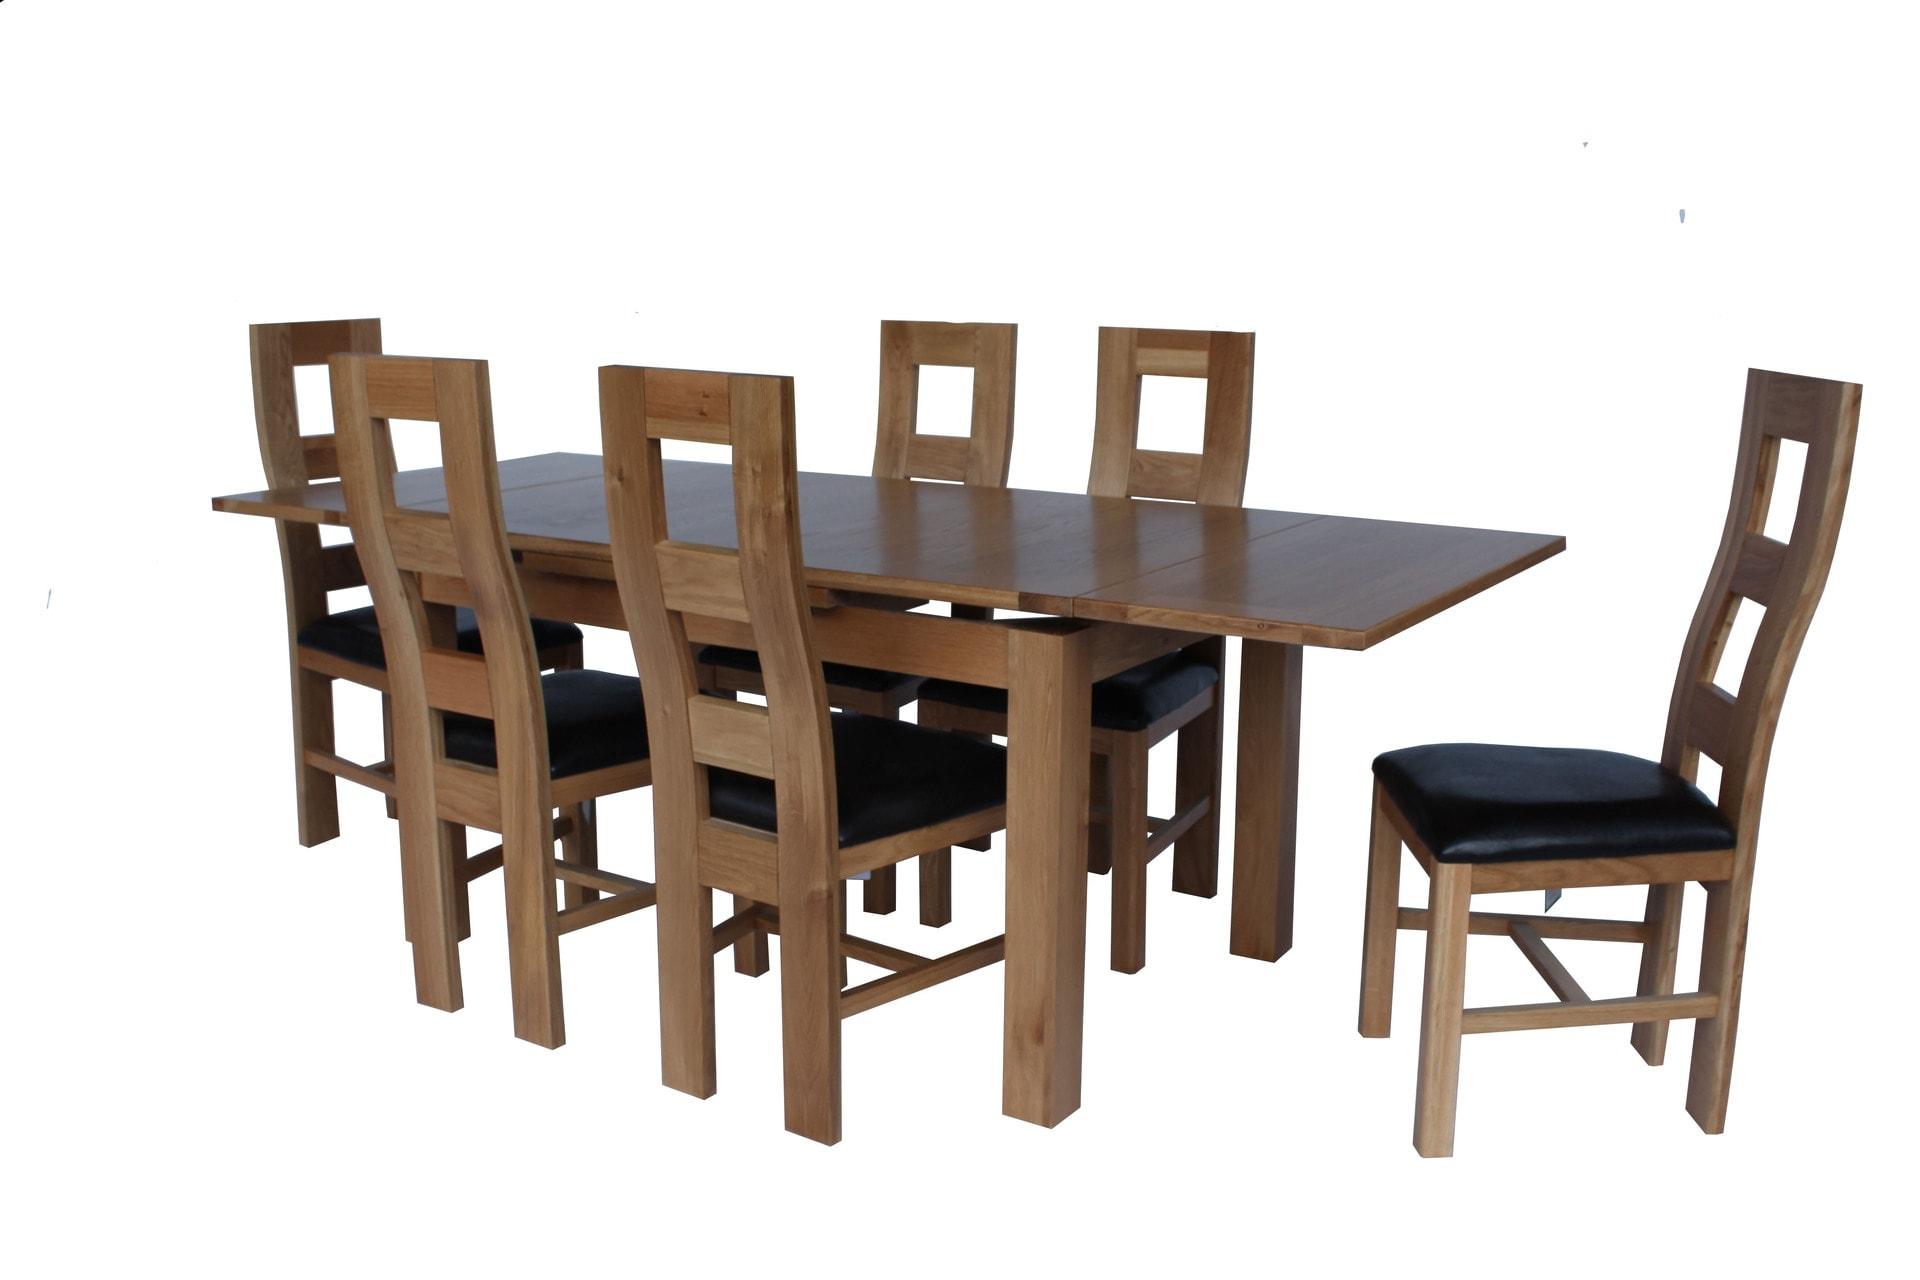 Astounding dining room sets portland oregon contemporary for Dining room tables portland or